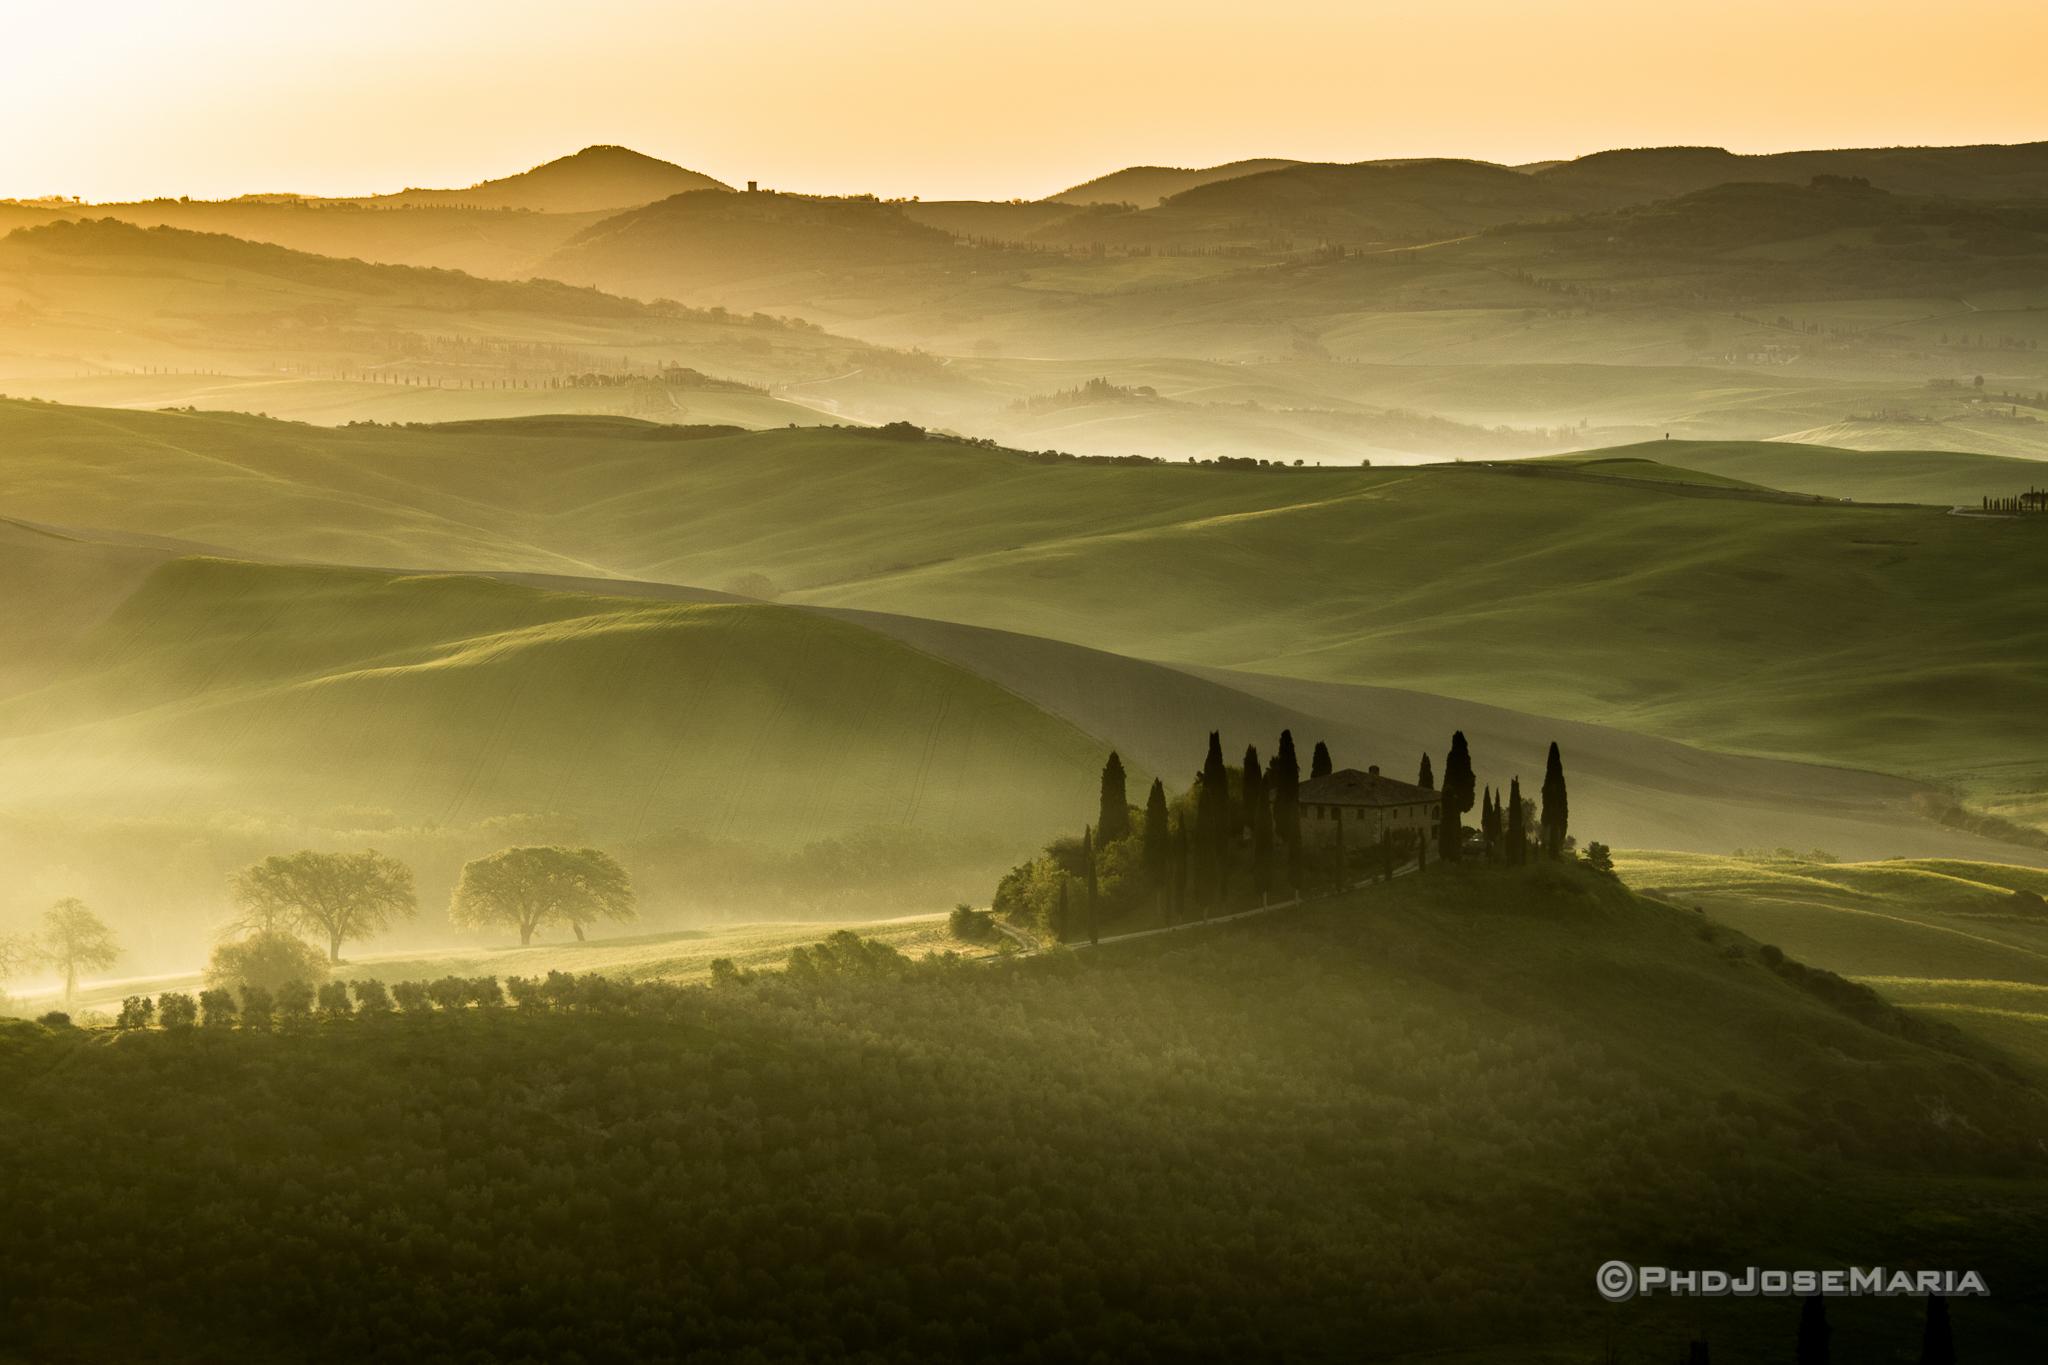 Os campos e o charme da Toscana